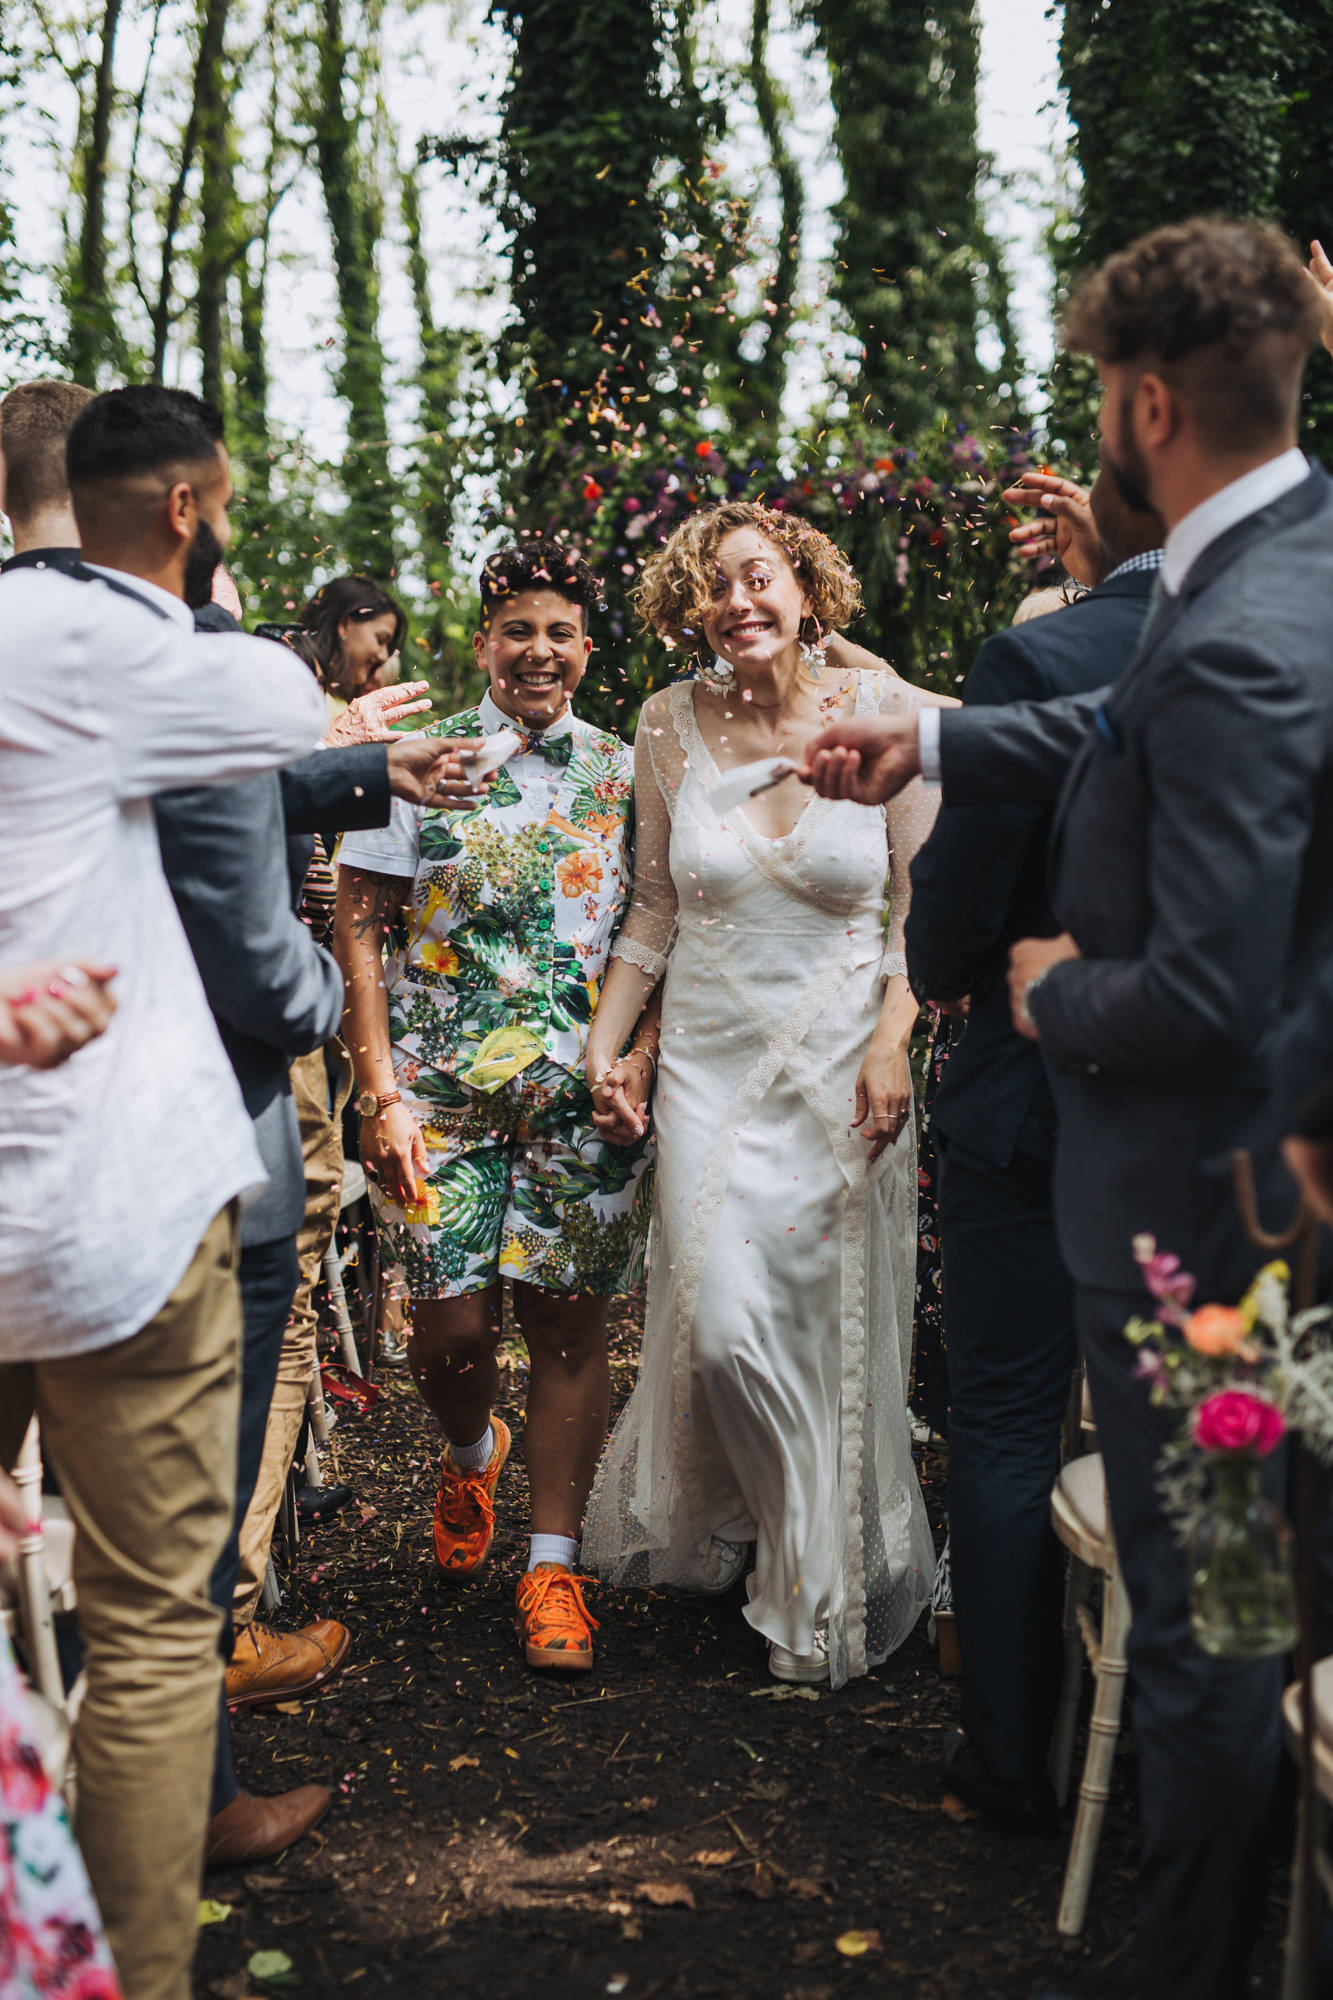 applewood wedding photographer leeds, yorkshire38.jpg